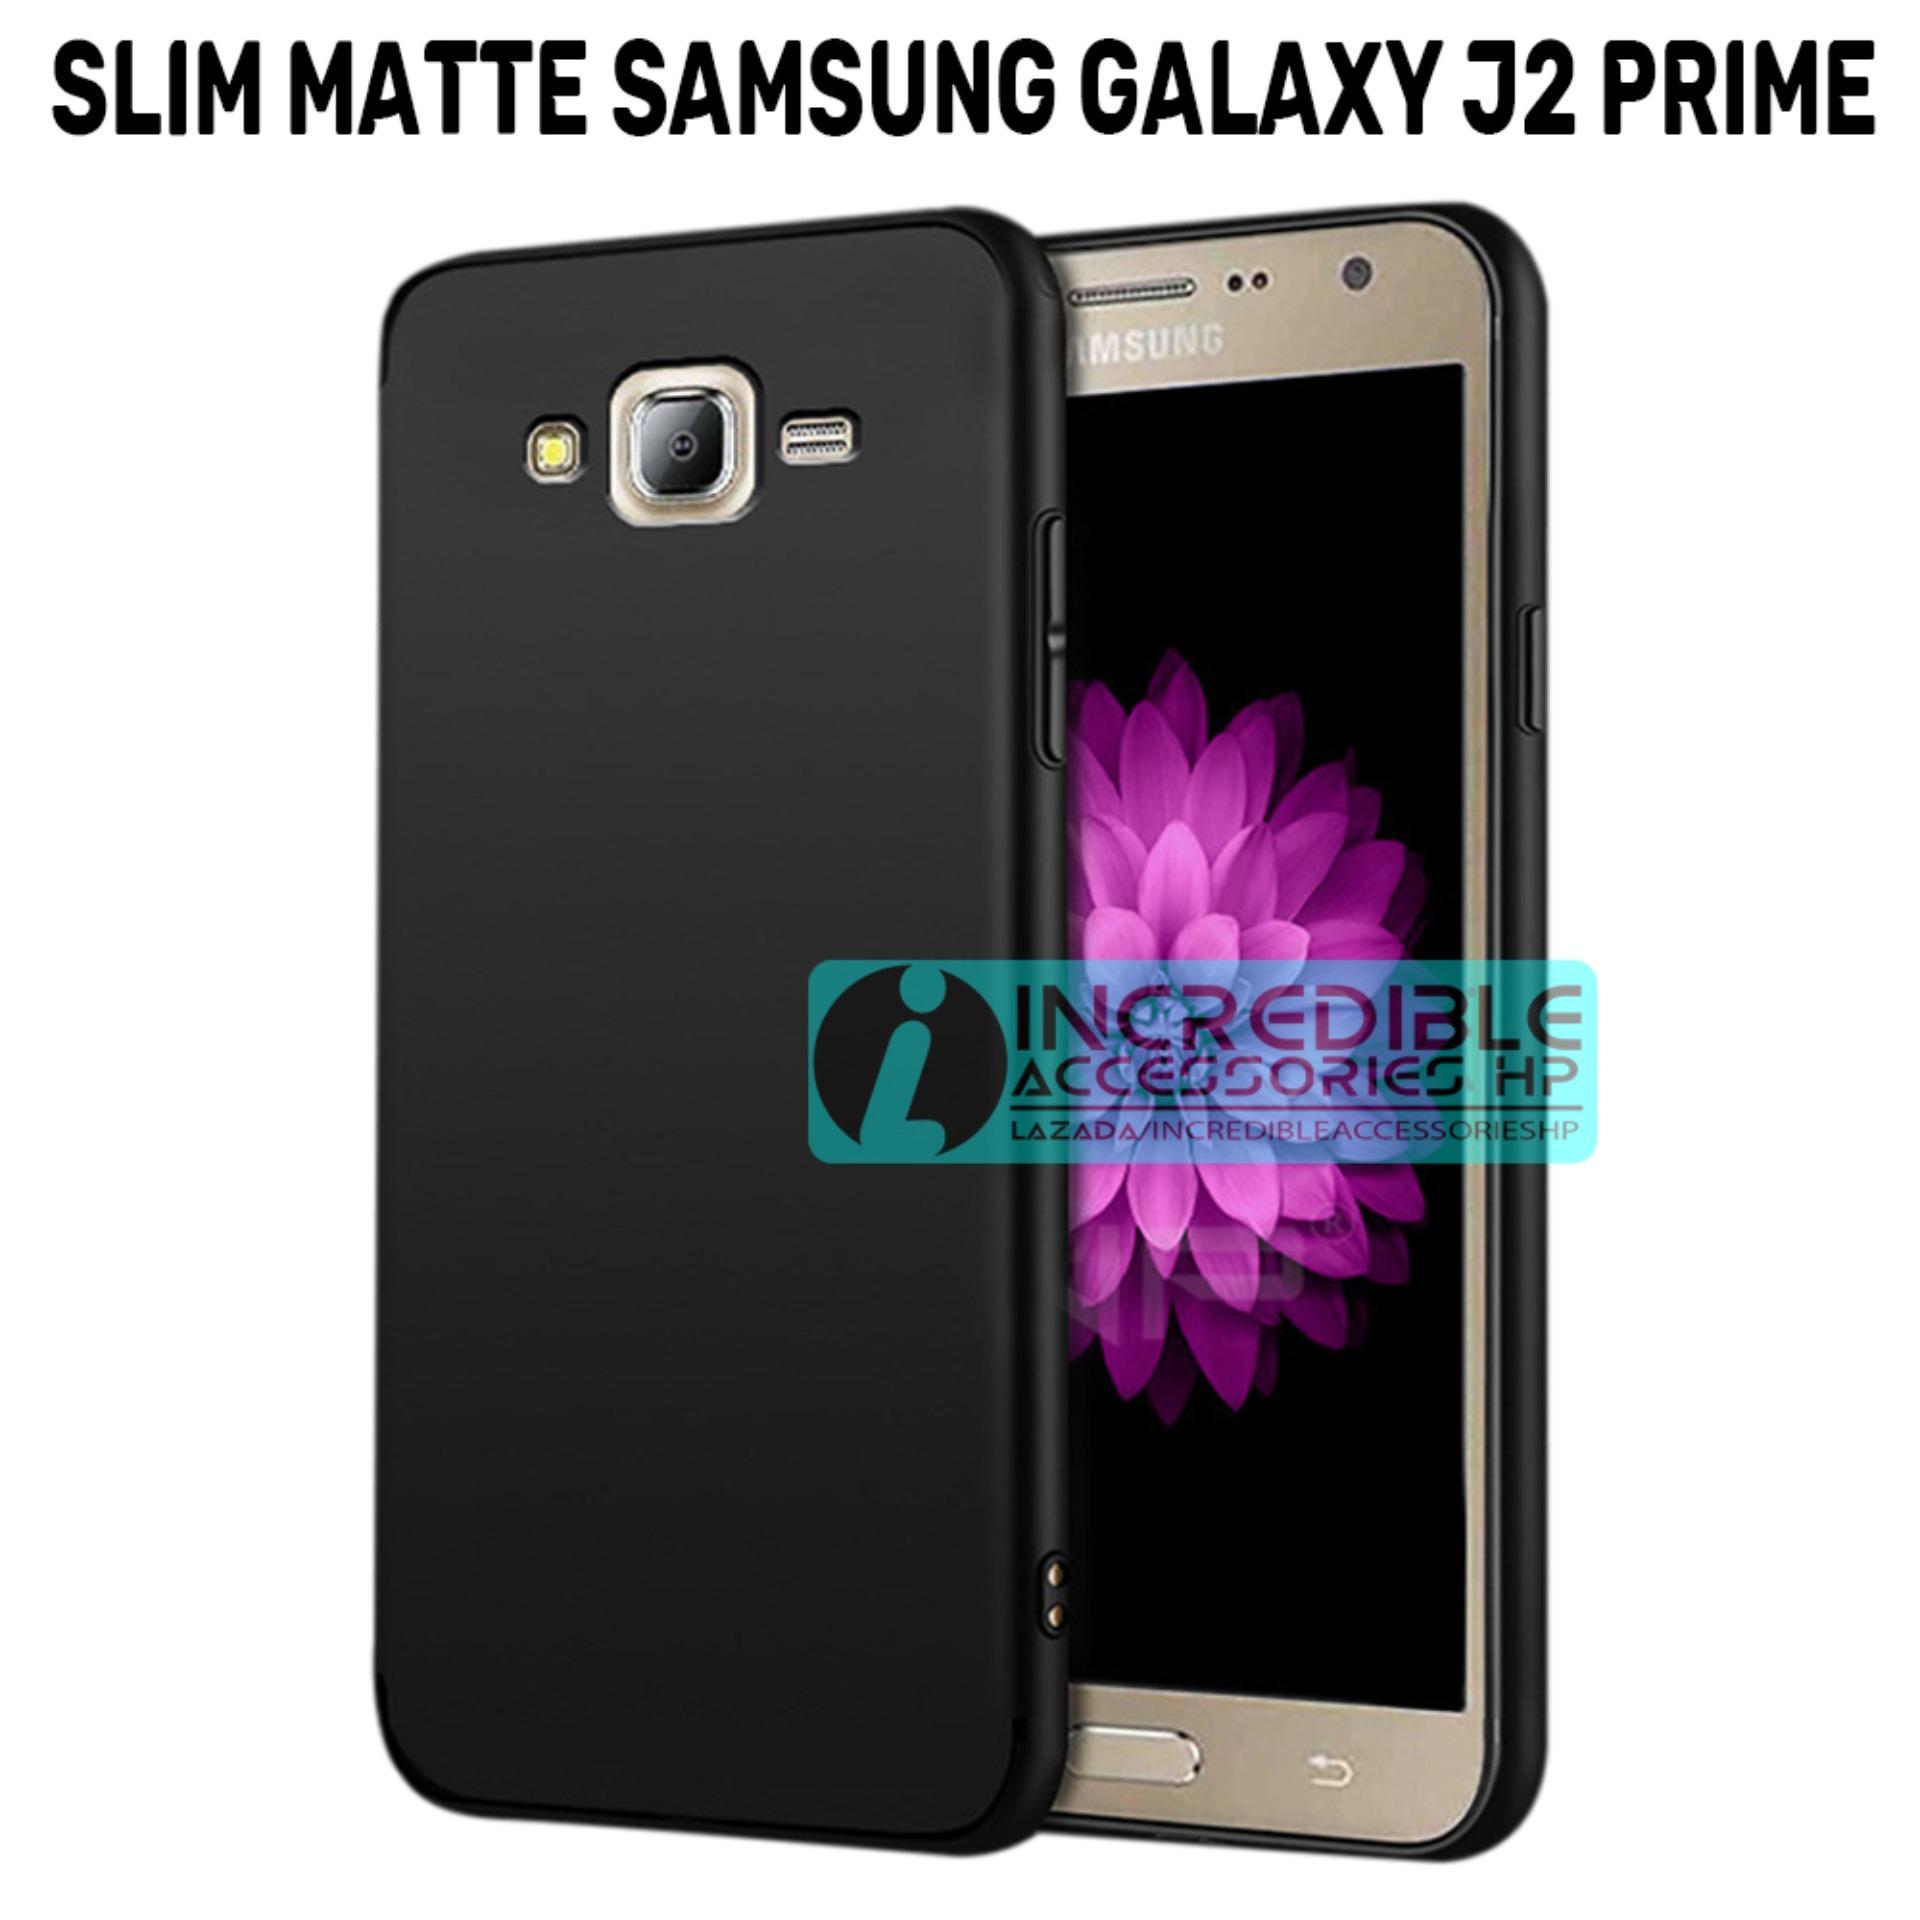 Anti Fingerprint Ultraslim Hybrid Case Baby Soft Babby Skin Softase Silicon Matte  for Samsung Galaxy J2 Prime - Black